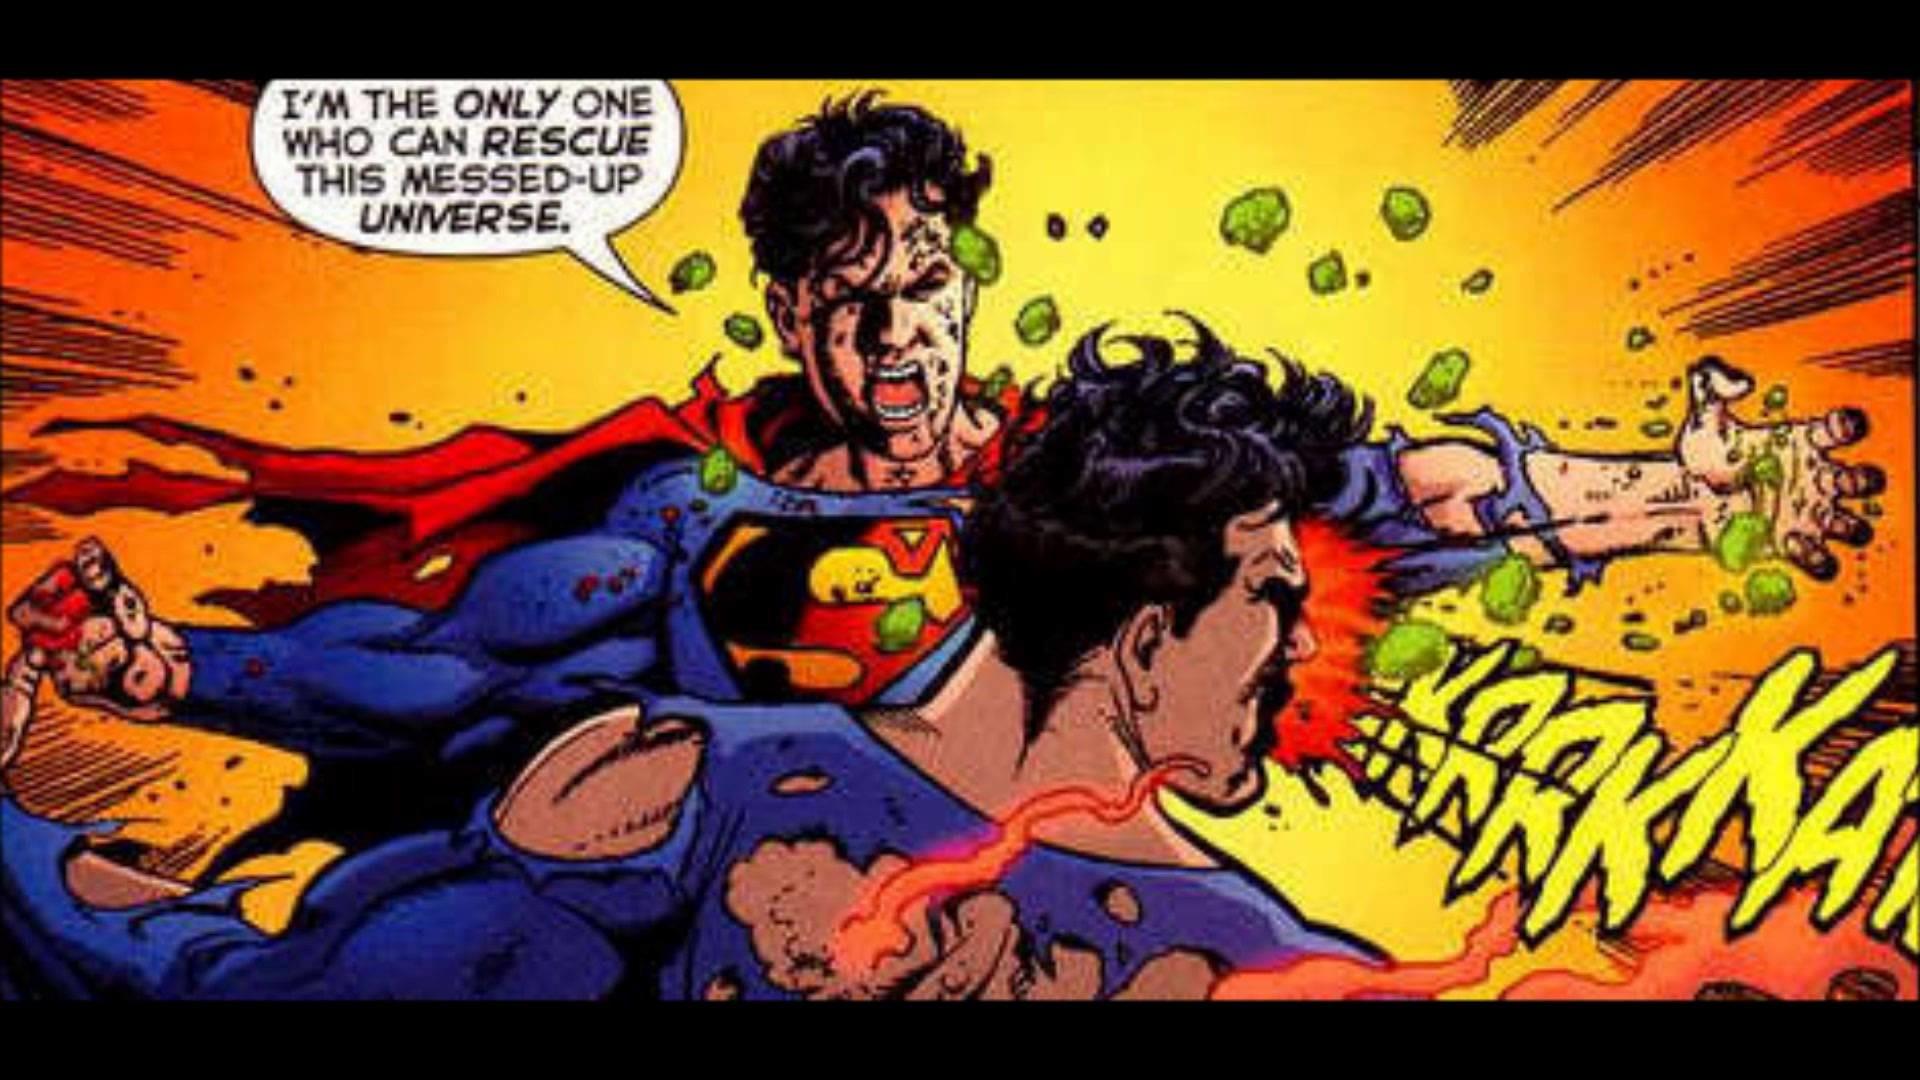 Superboy-Prime vs. Superman – Infinite Crisis #7, DC Comics